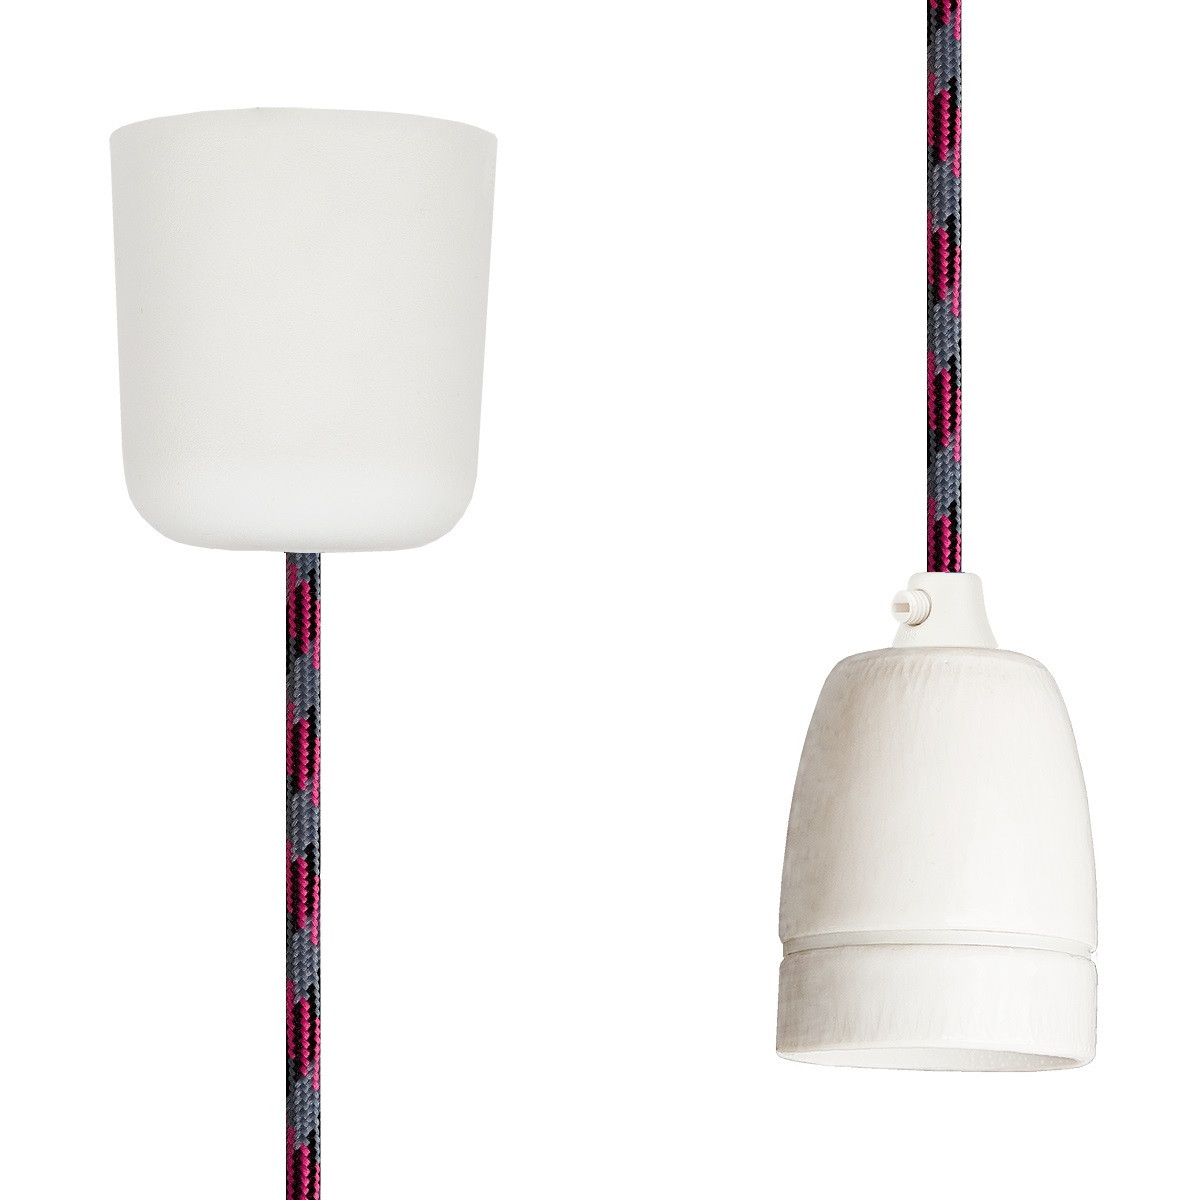 Pendant Lamp Porcelain Grey-Black-Cerise